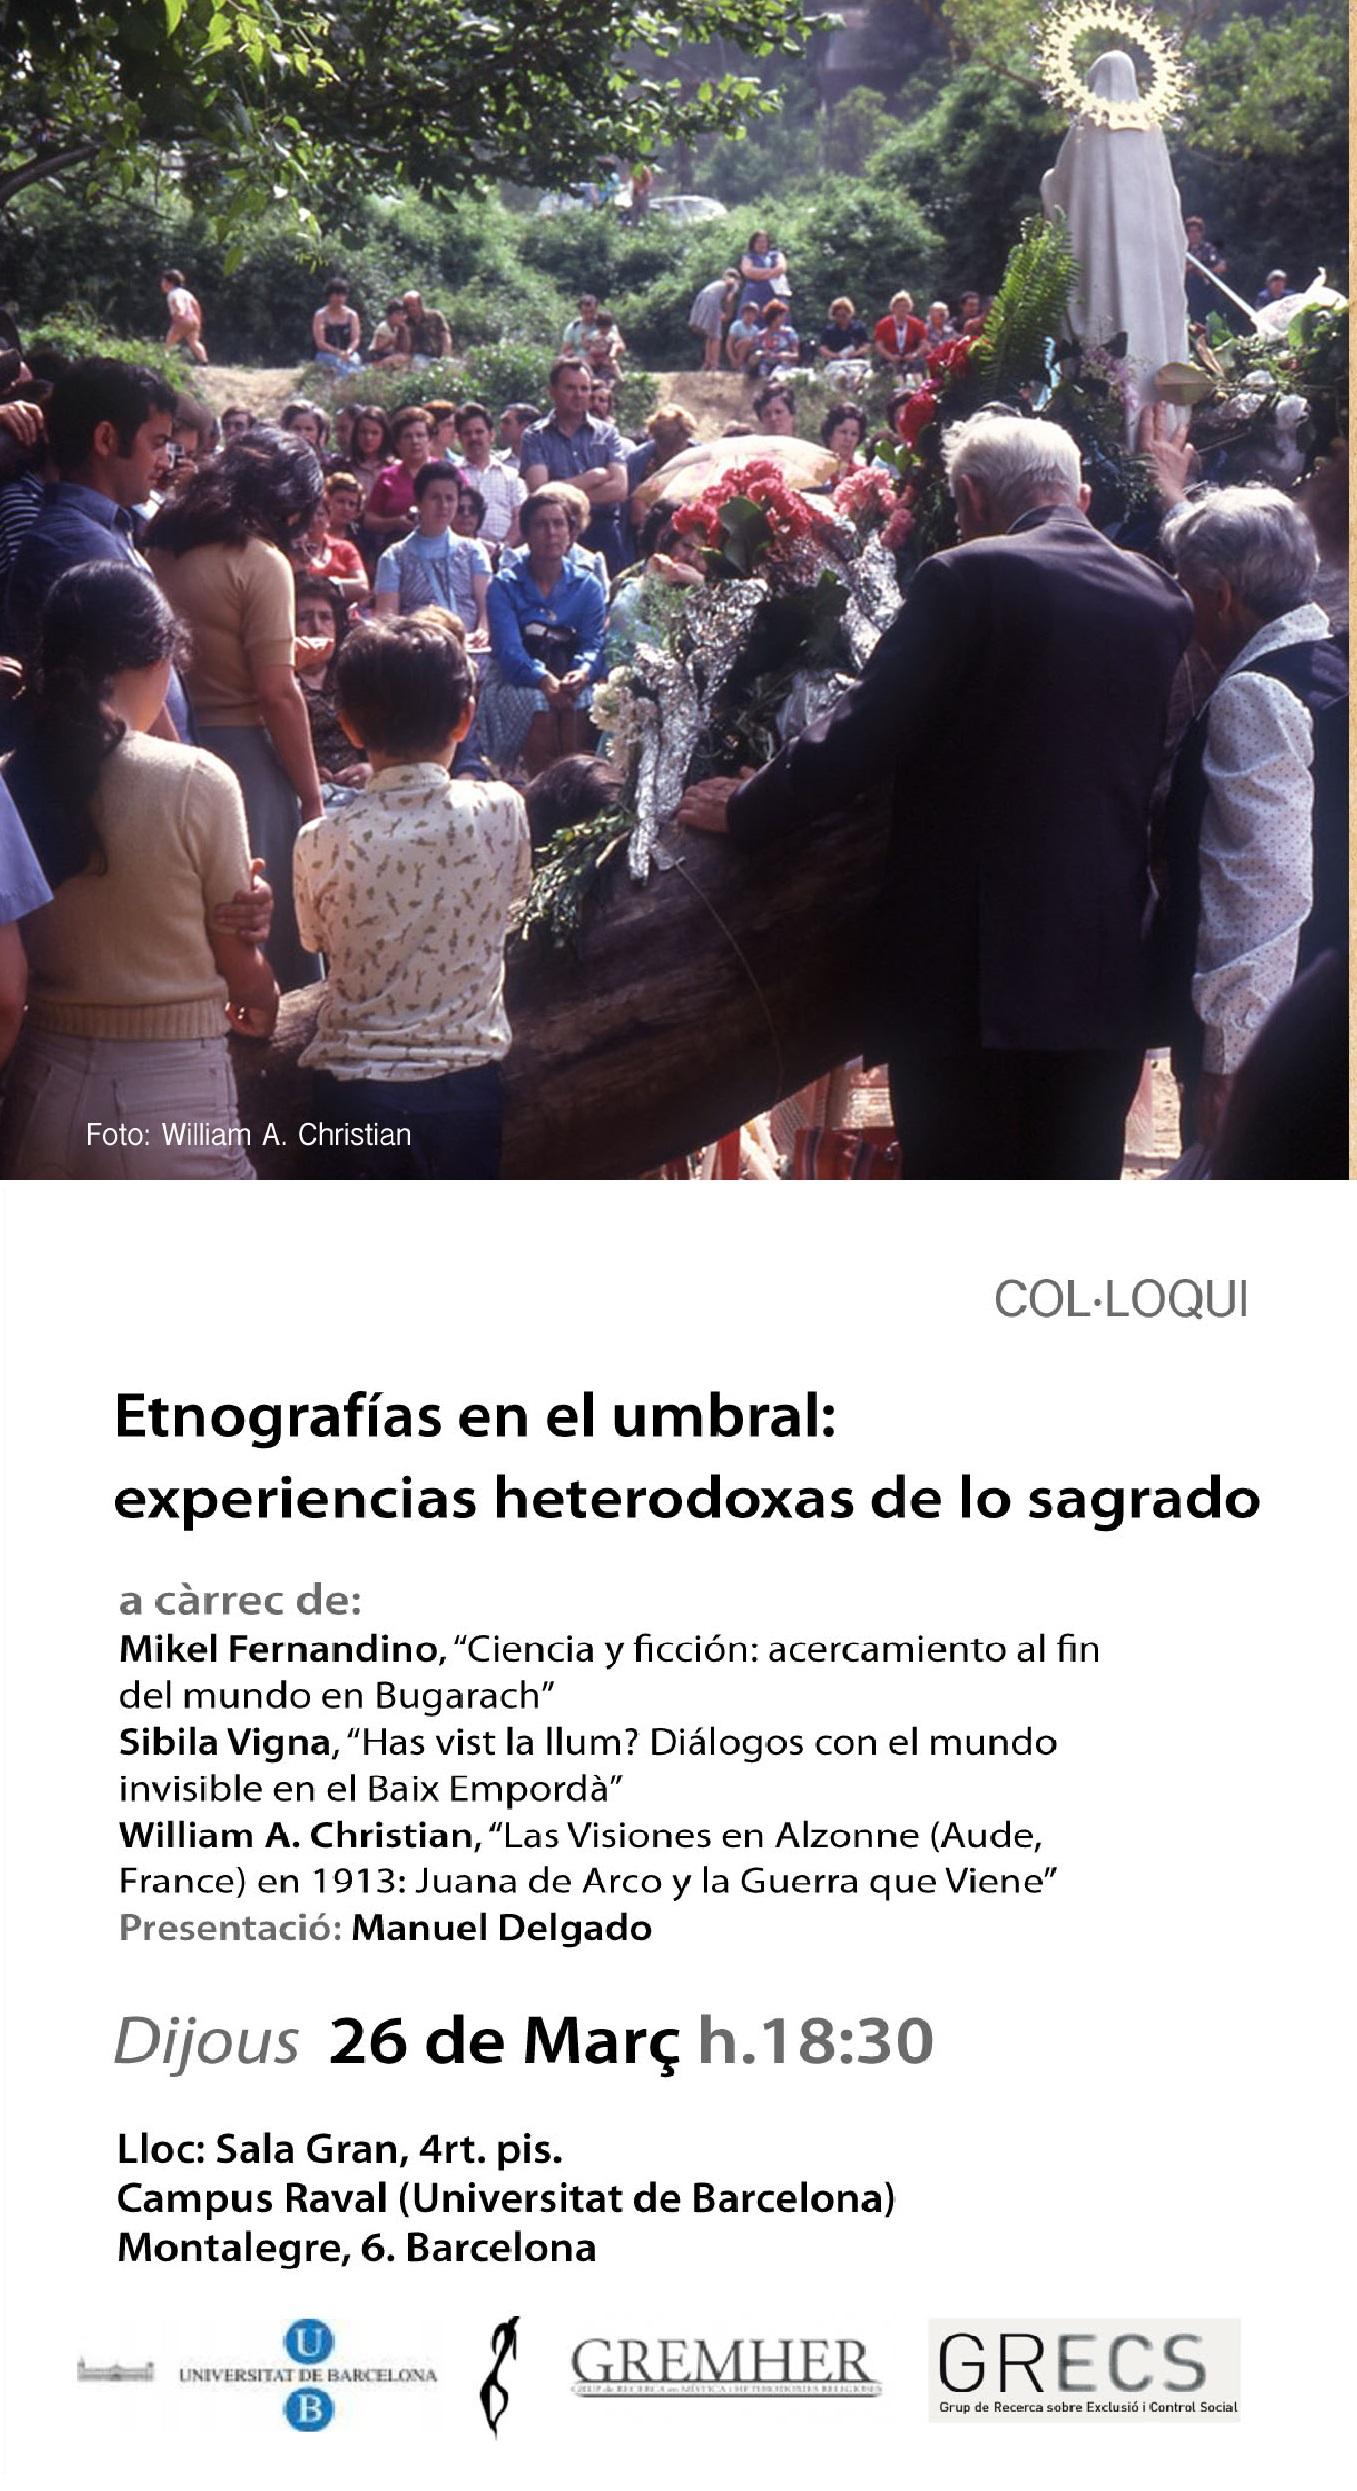 INVITACION ETNOGRAFIAS UMBRAL